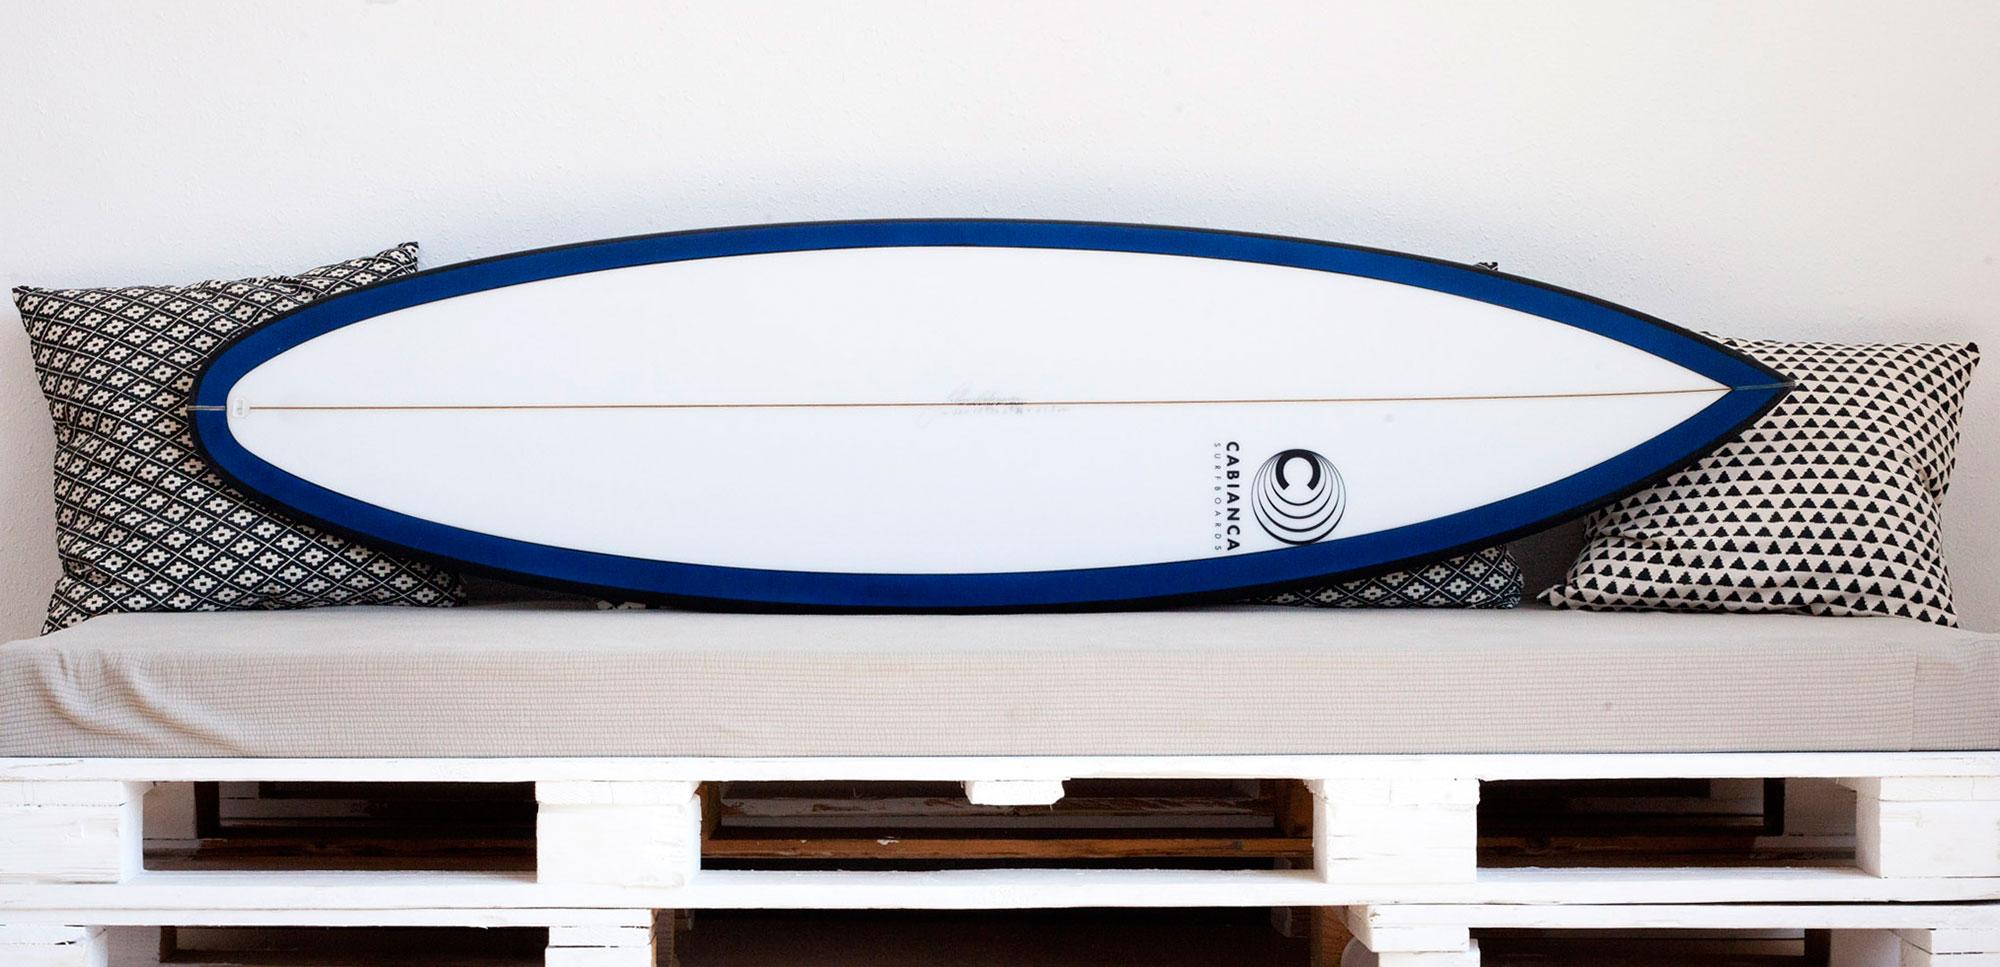 Cabianca Surfboards DFK